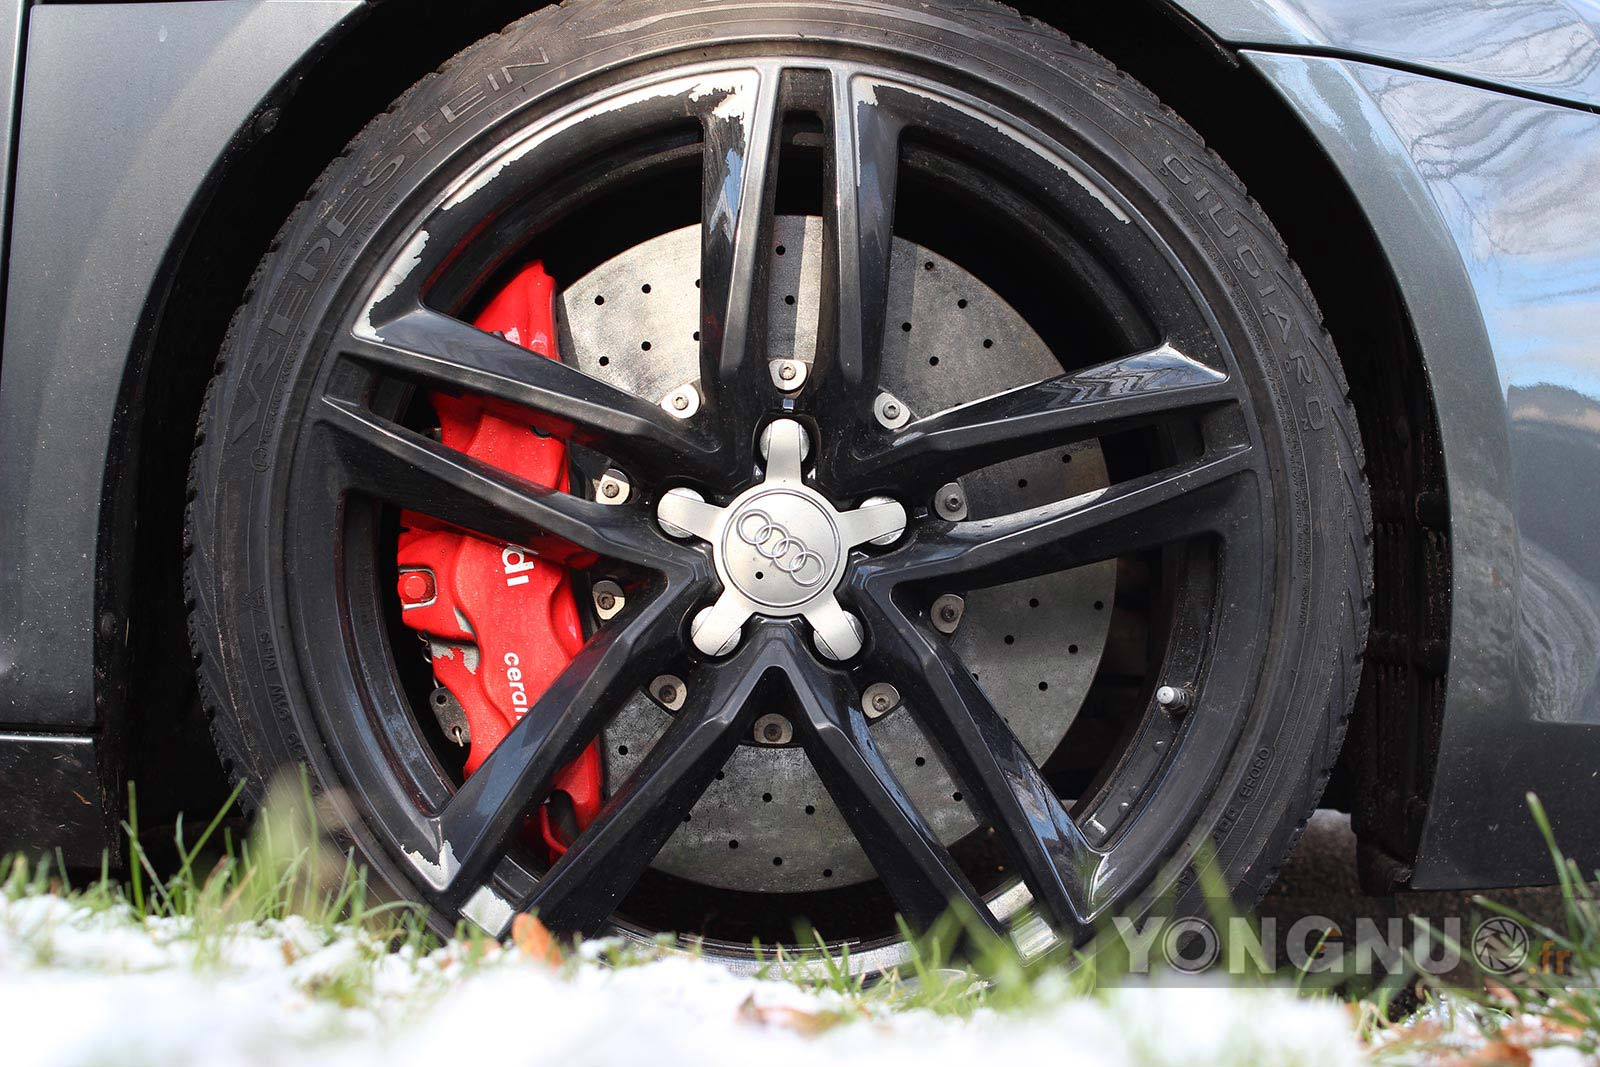 Audi R8 - Yongnuo 35mm f/2